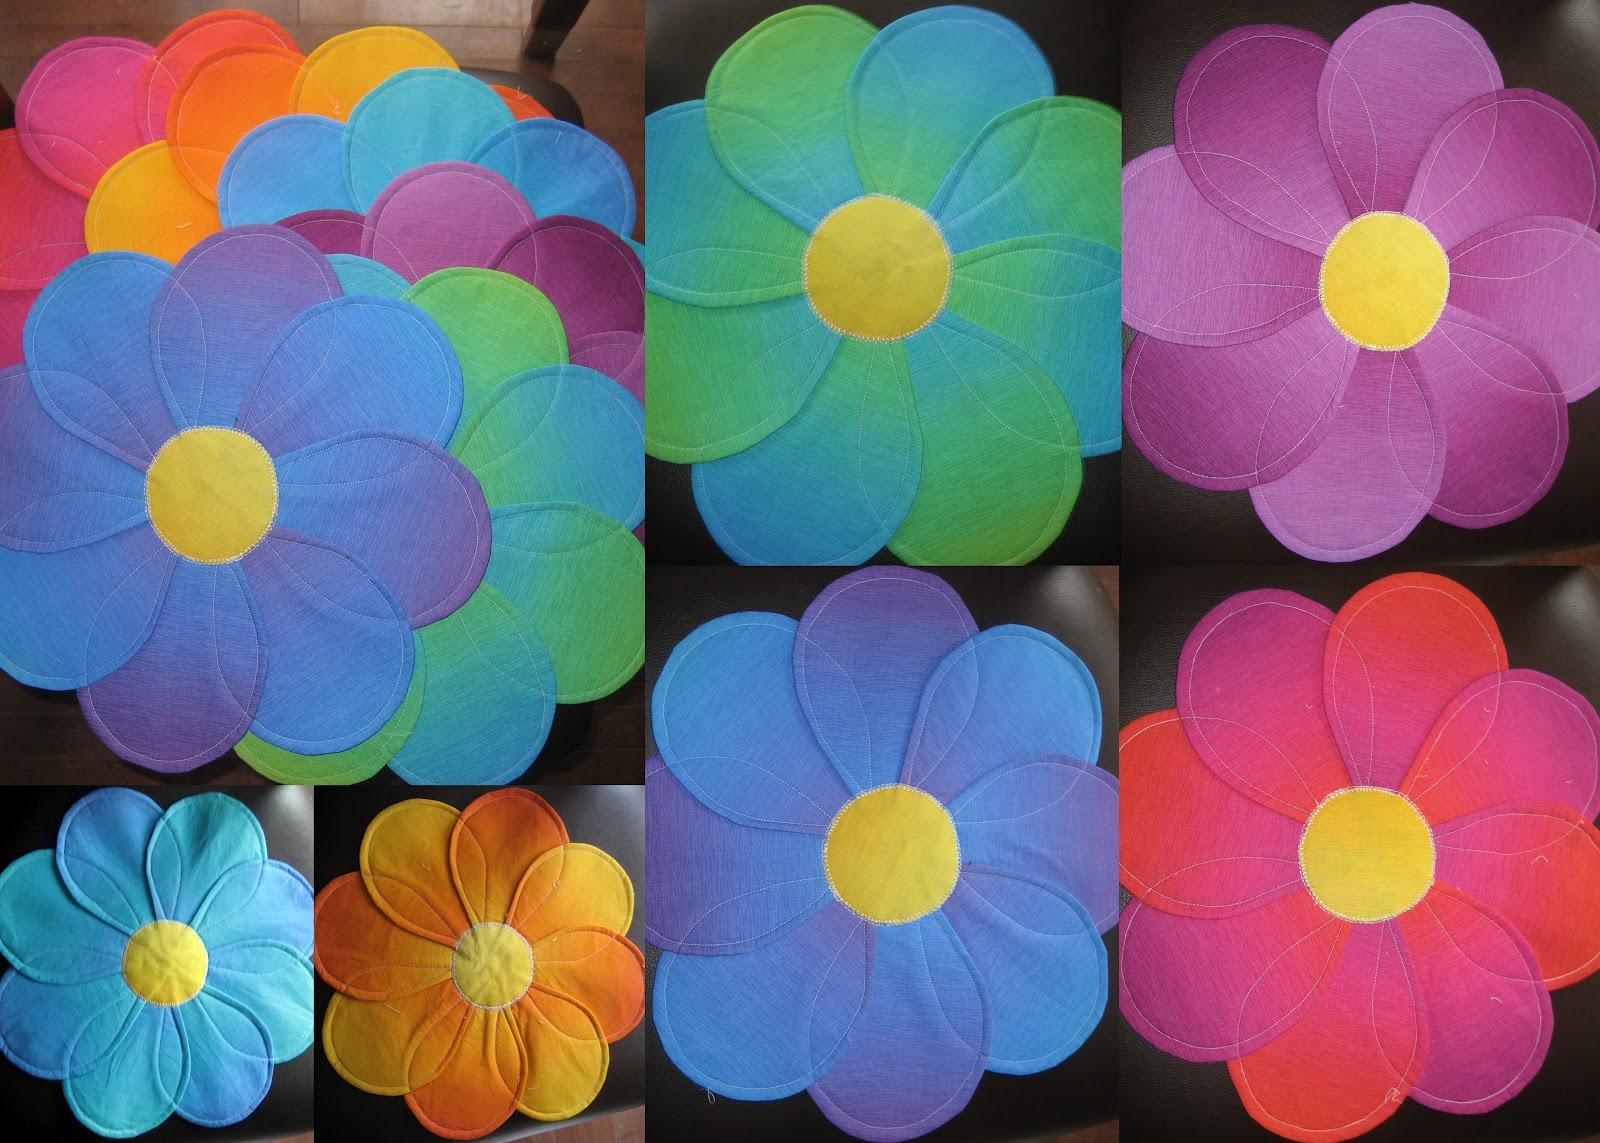 Flower petal place mats fabbric crafts - Crafts with flower petals ...